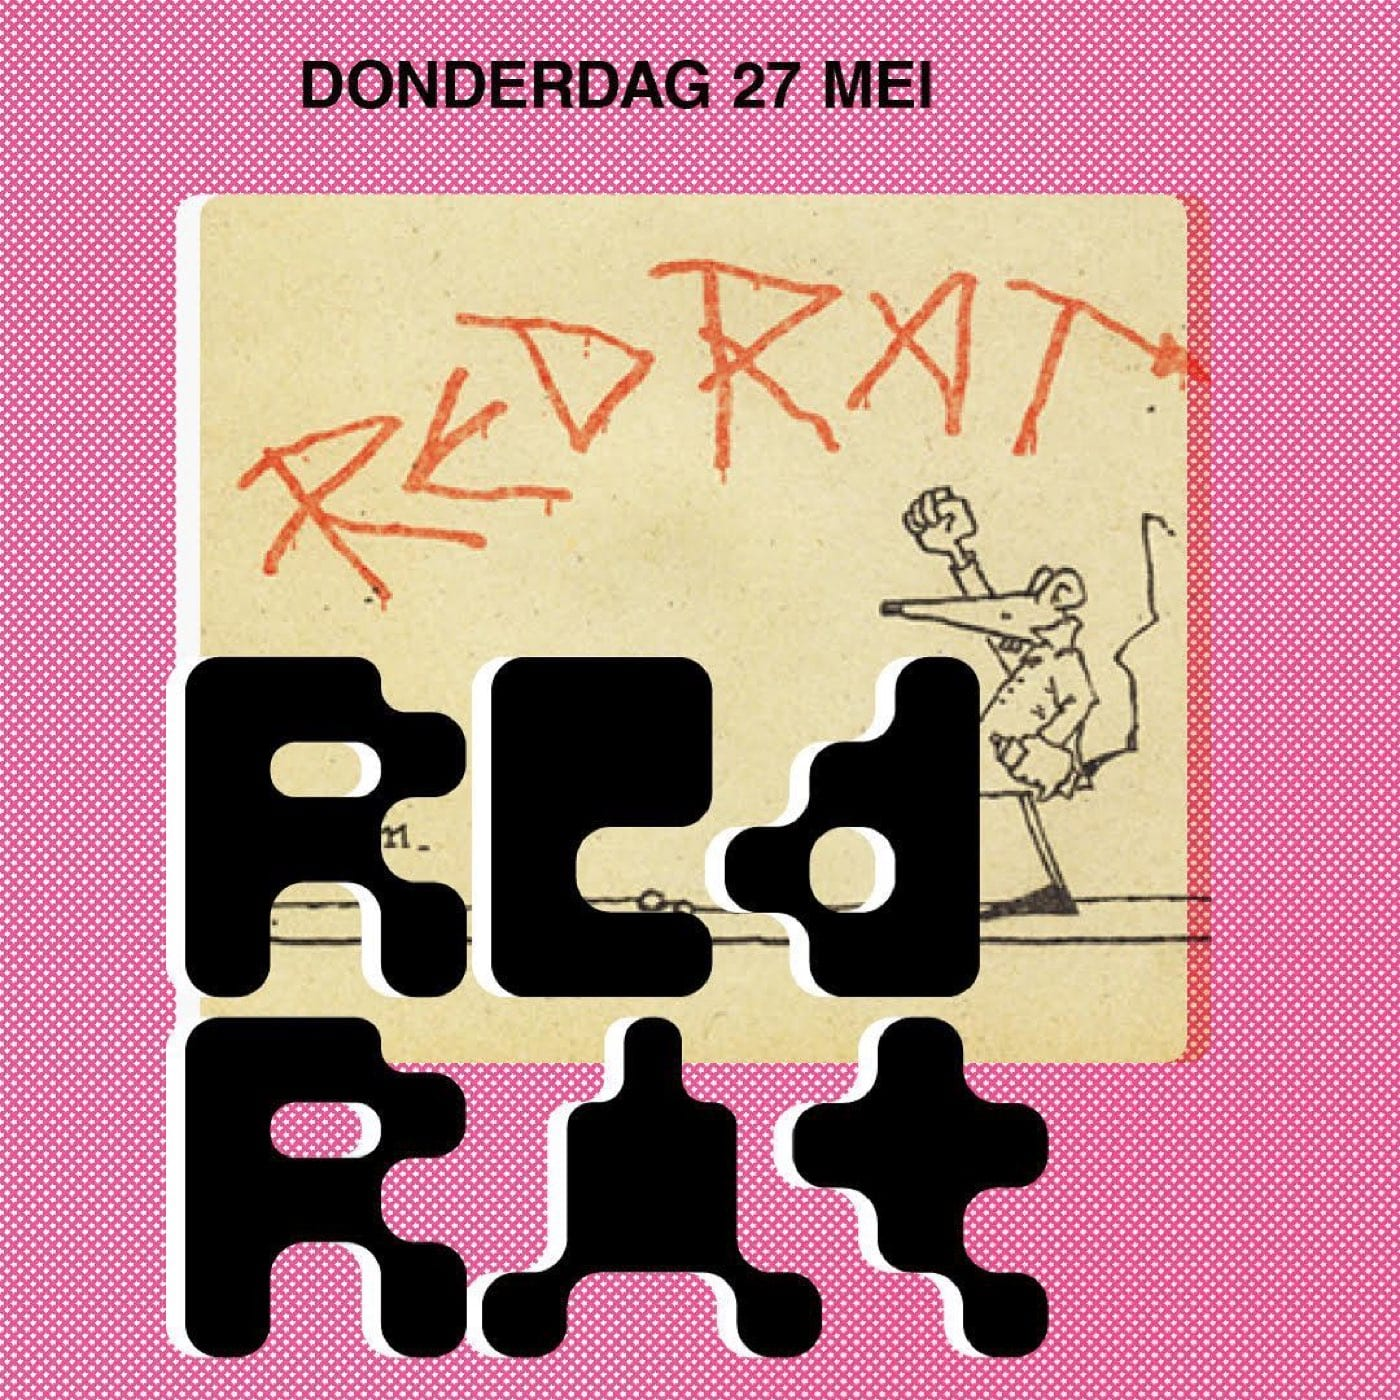 Red Rat - Kladmuur